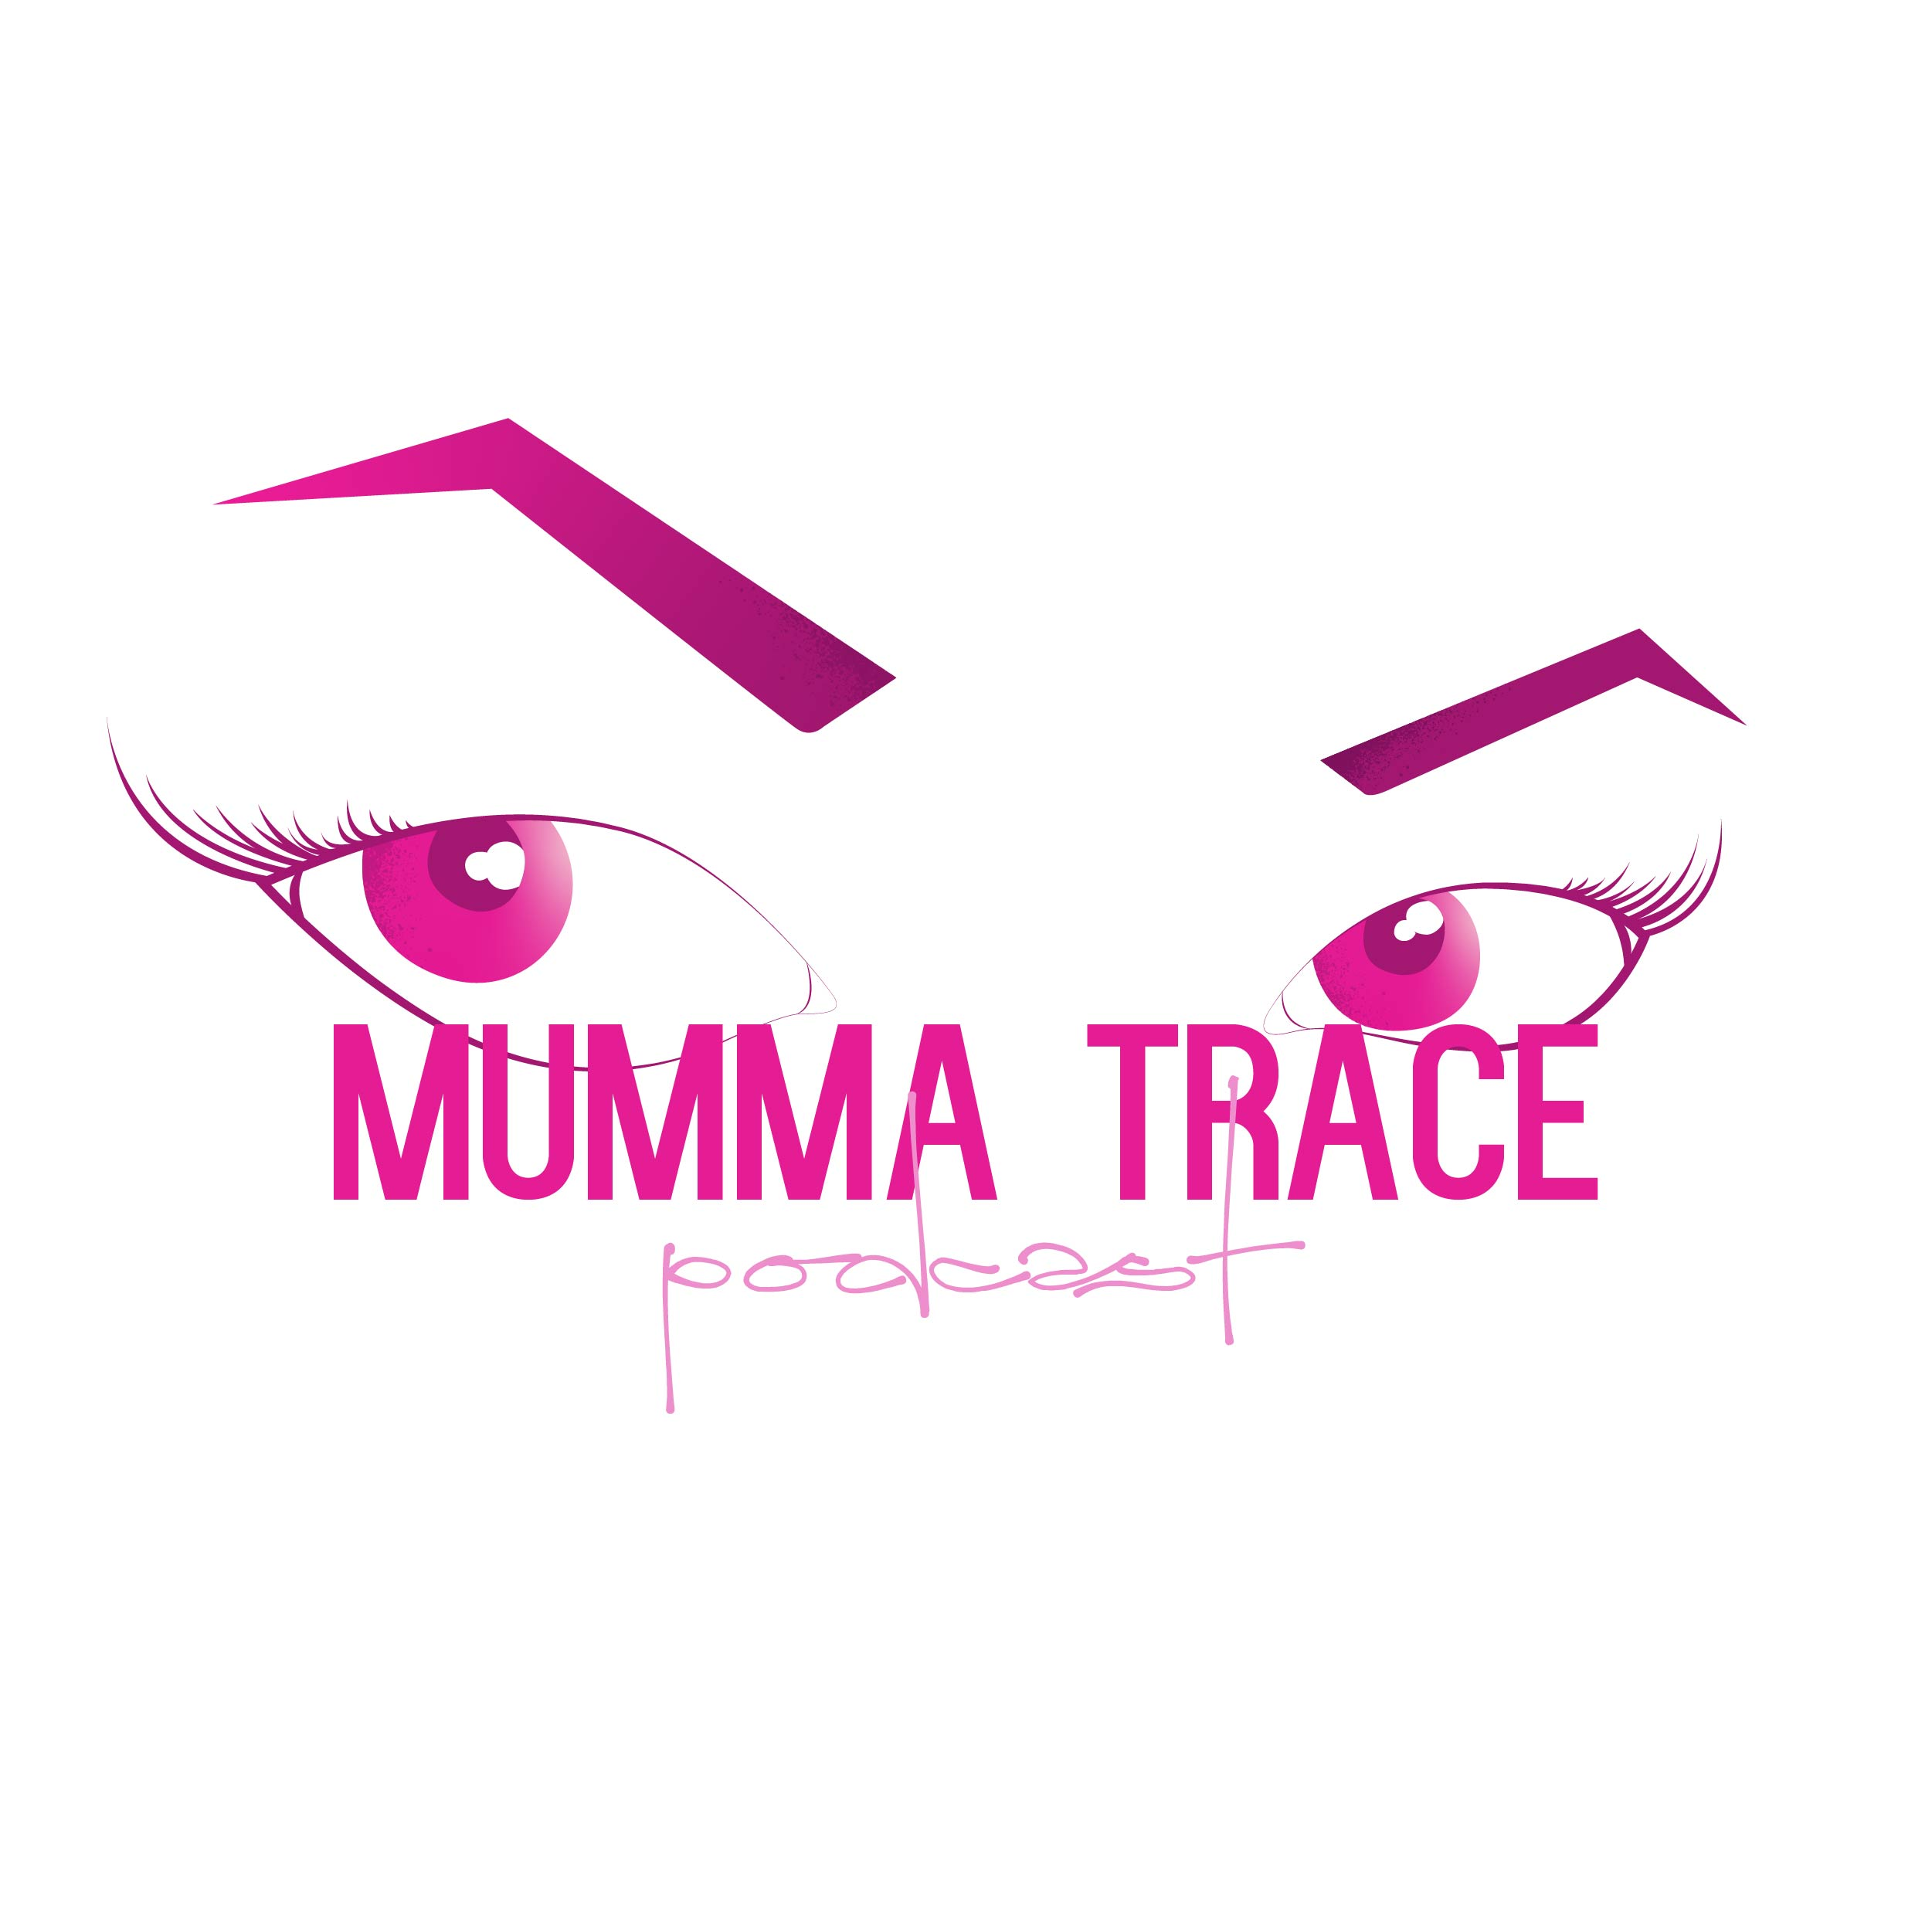 Mumma Trace's Inspirationals